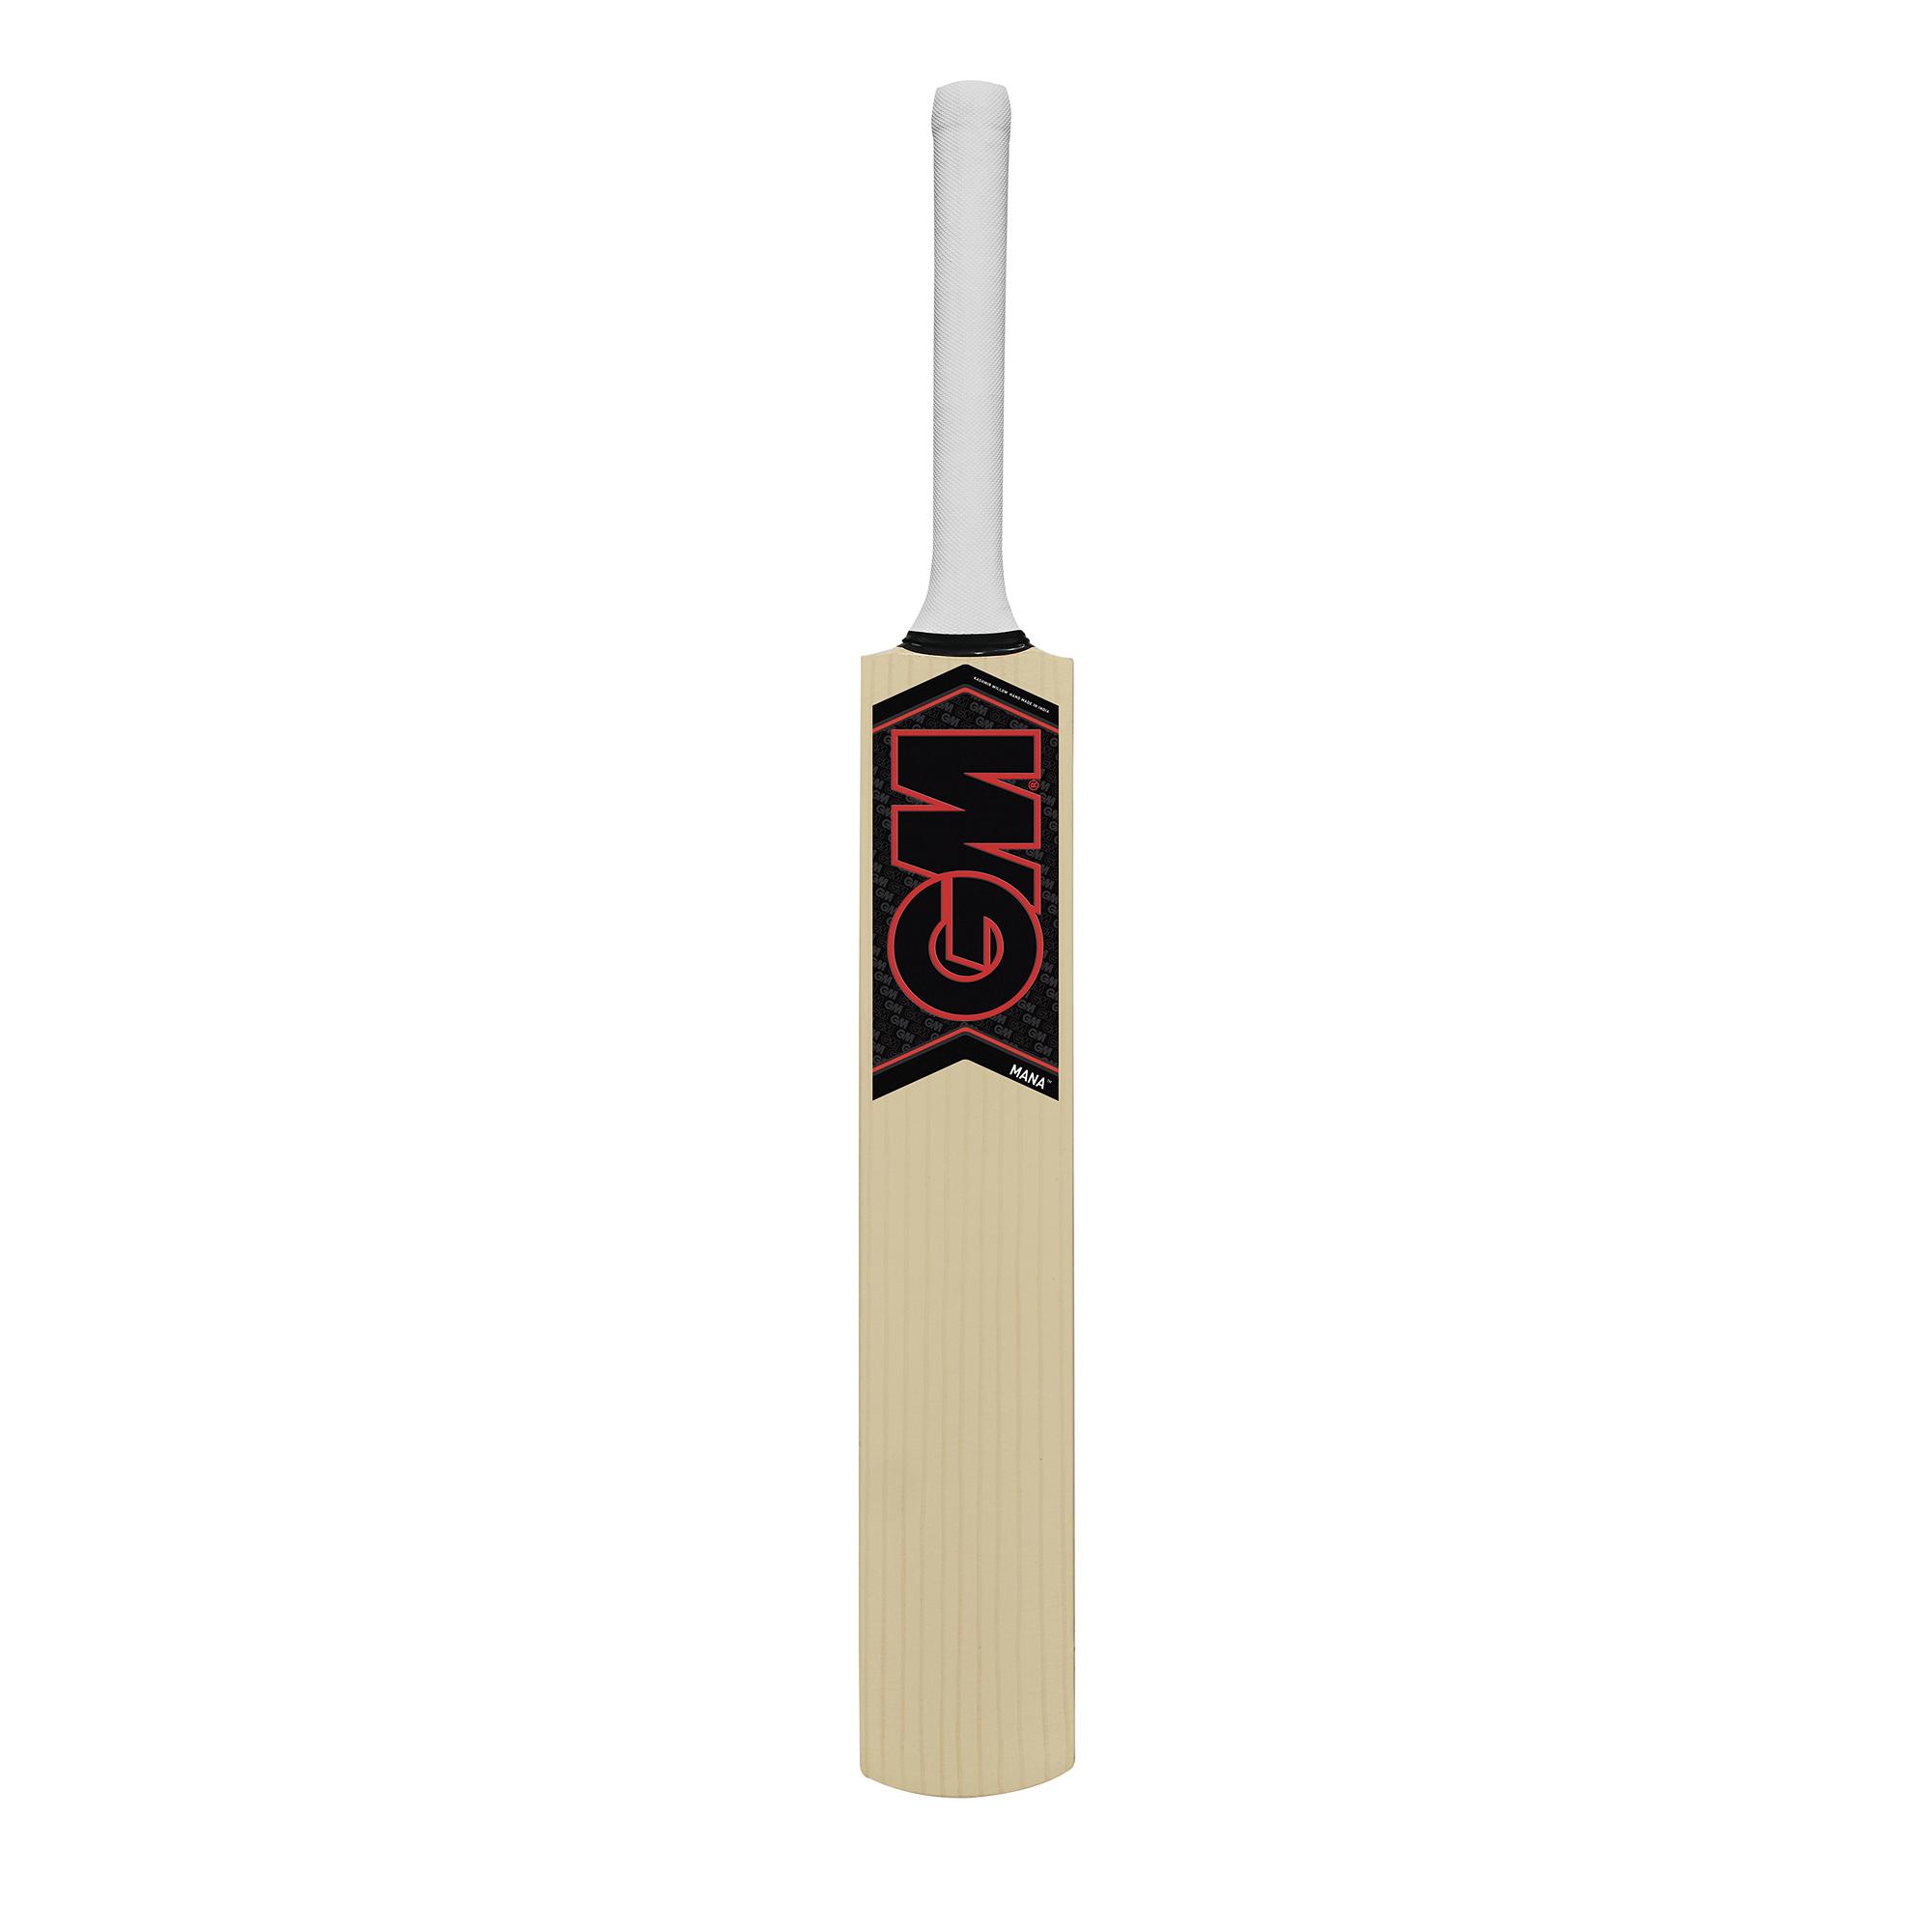 GM Kinder Mana Cricket